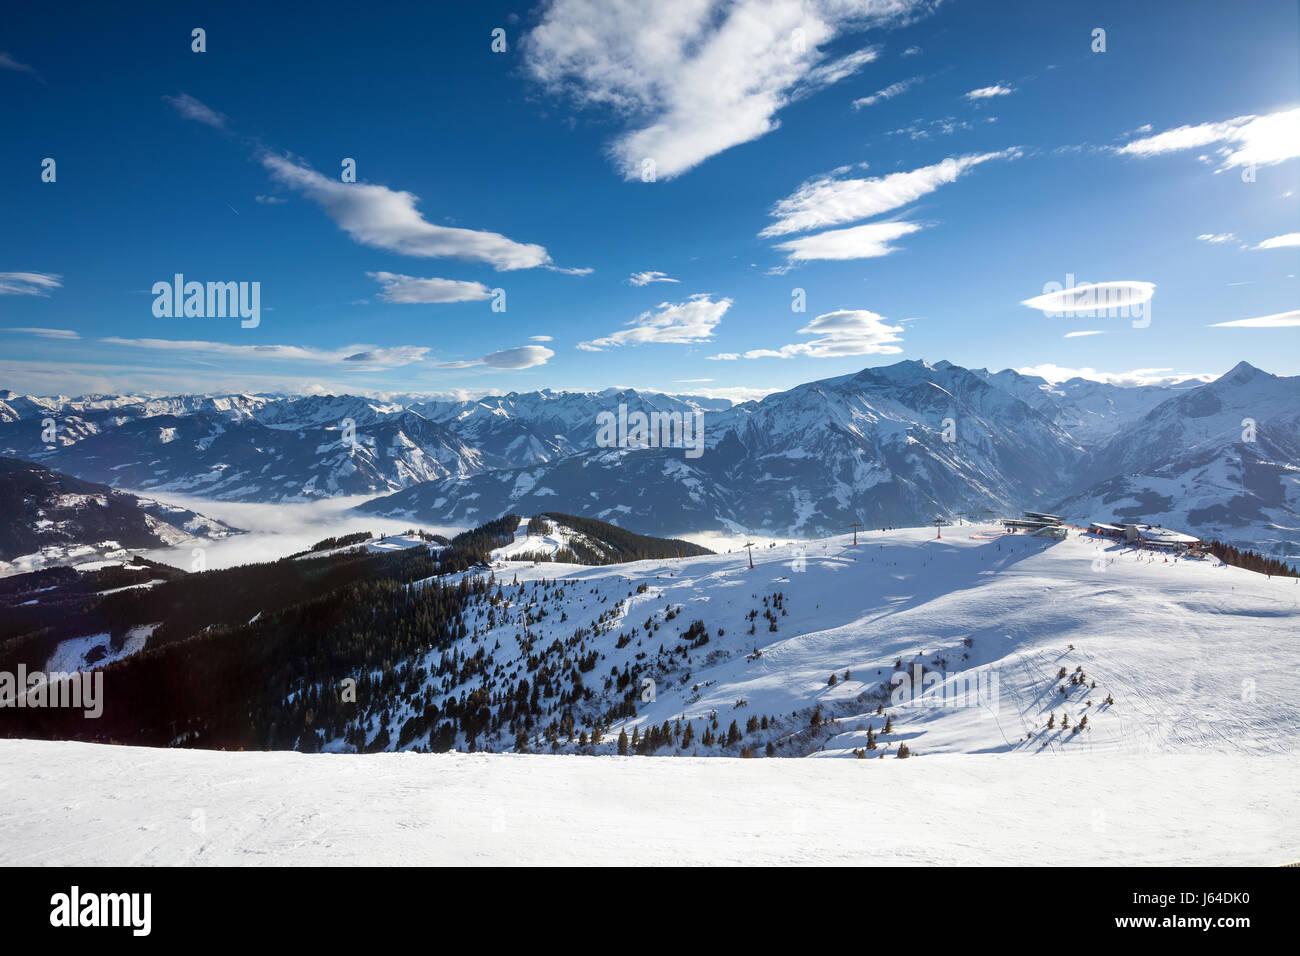 Schmitten winter ski slopes of Zell am See resort Stock Photo